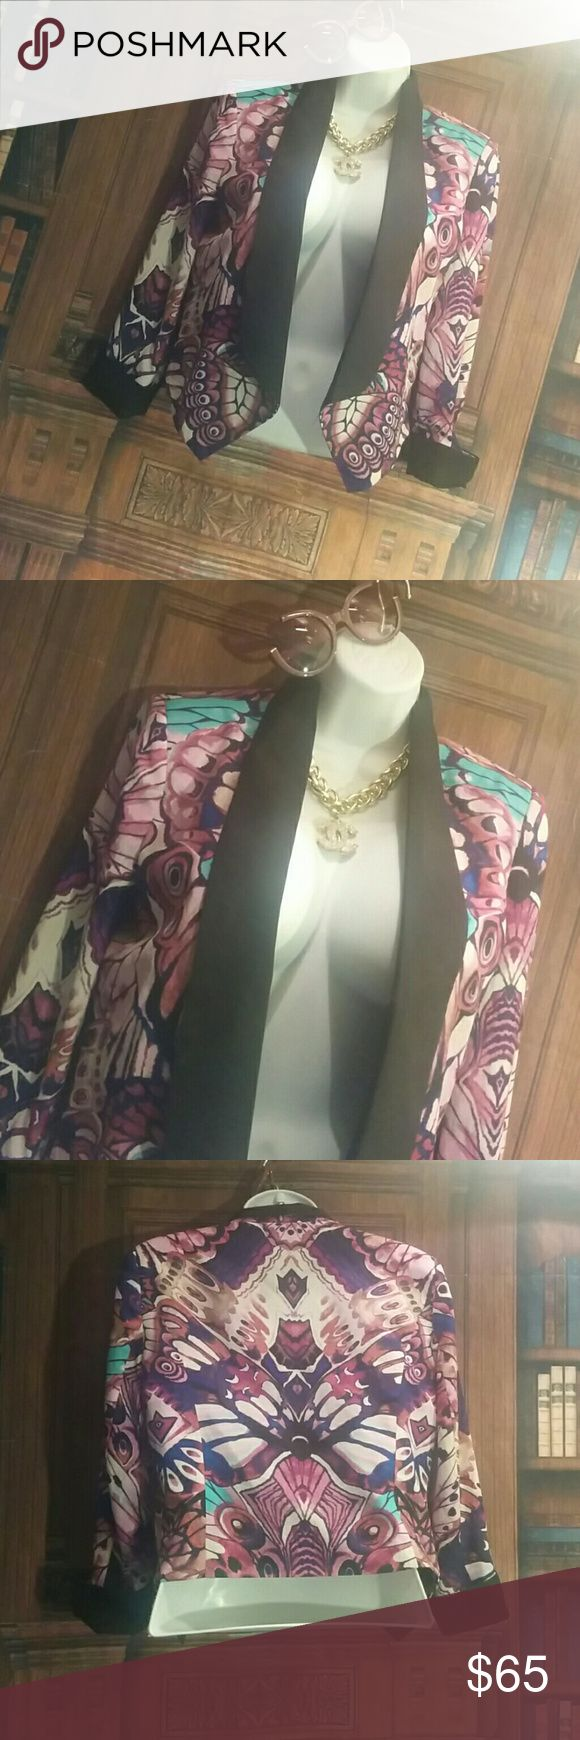 Bebe retro butterfly Blazer Other items sold separately nwot bebe Jackets & Coats Blazers